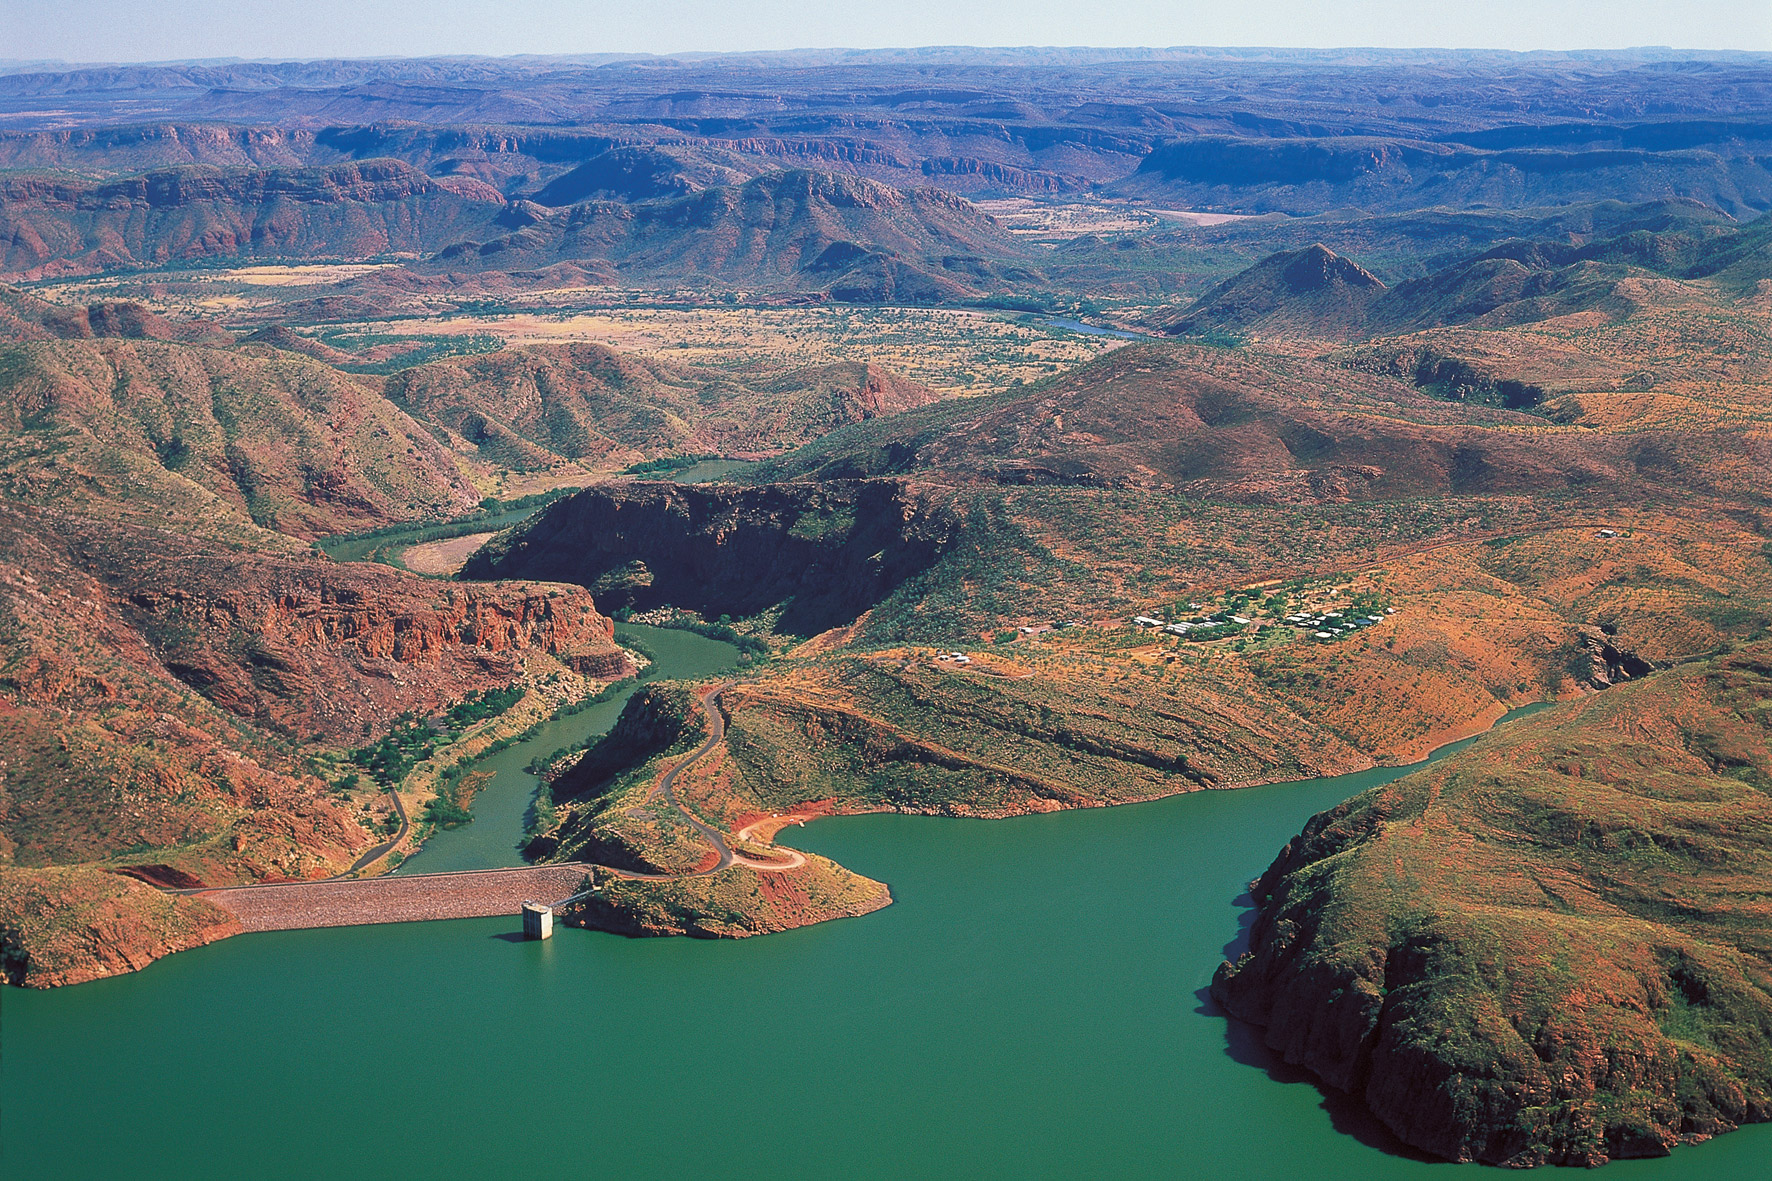 Wonders of the Kimberley | Lake Argyle, Kununurra, The Kimberley, North West, Western Australia